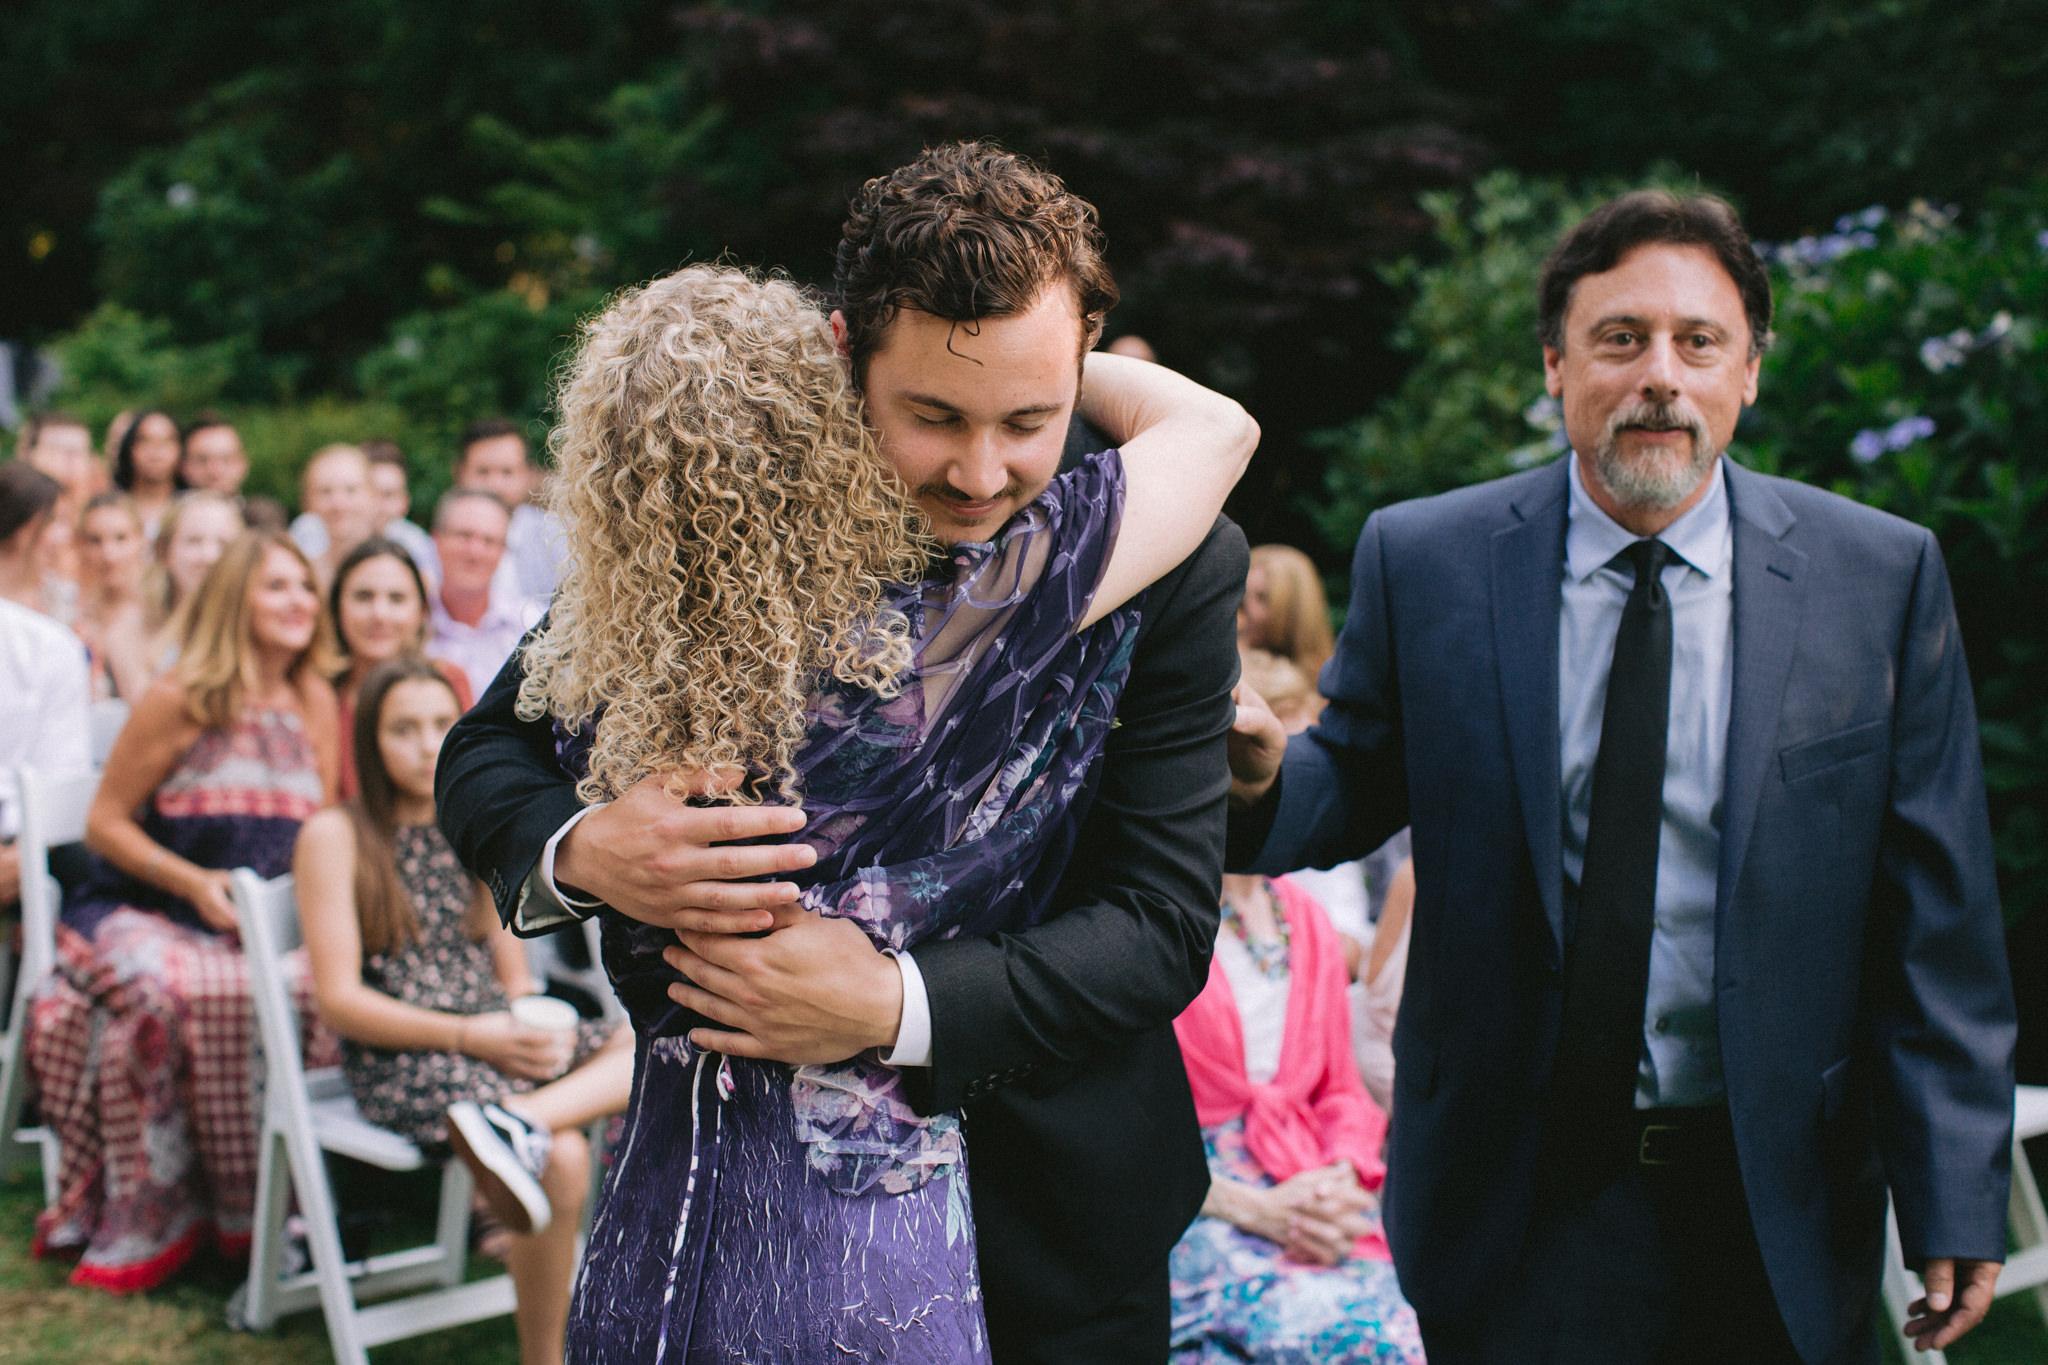 Backyard-Bainbridge-Island-Wedding-Alycia-Lovell-Photography-84.JPG